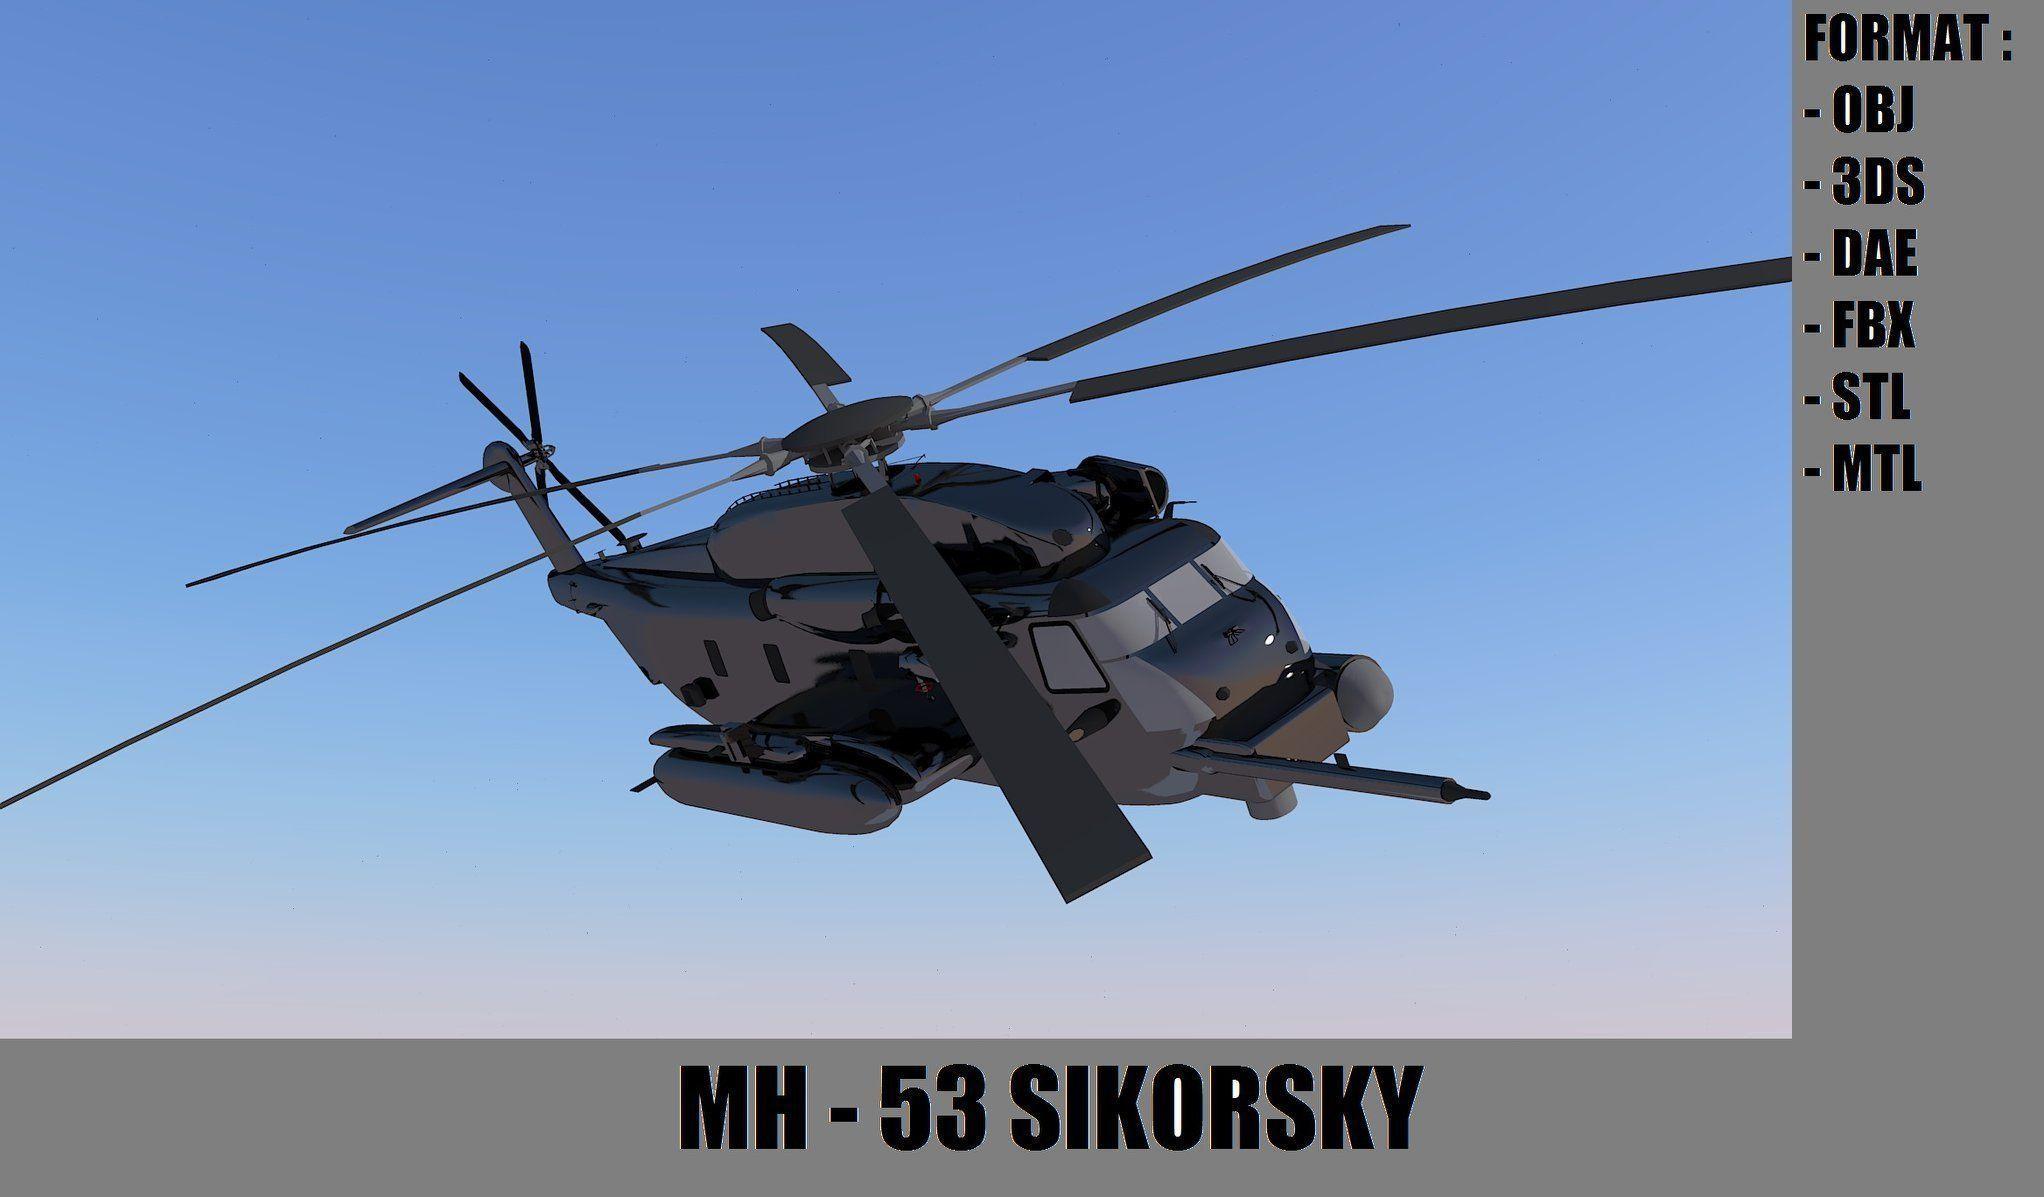 MH-53 SIKORSKY